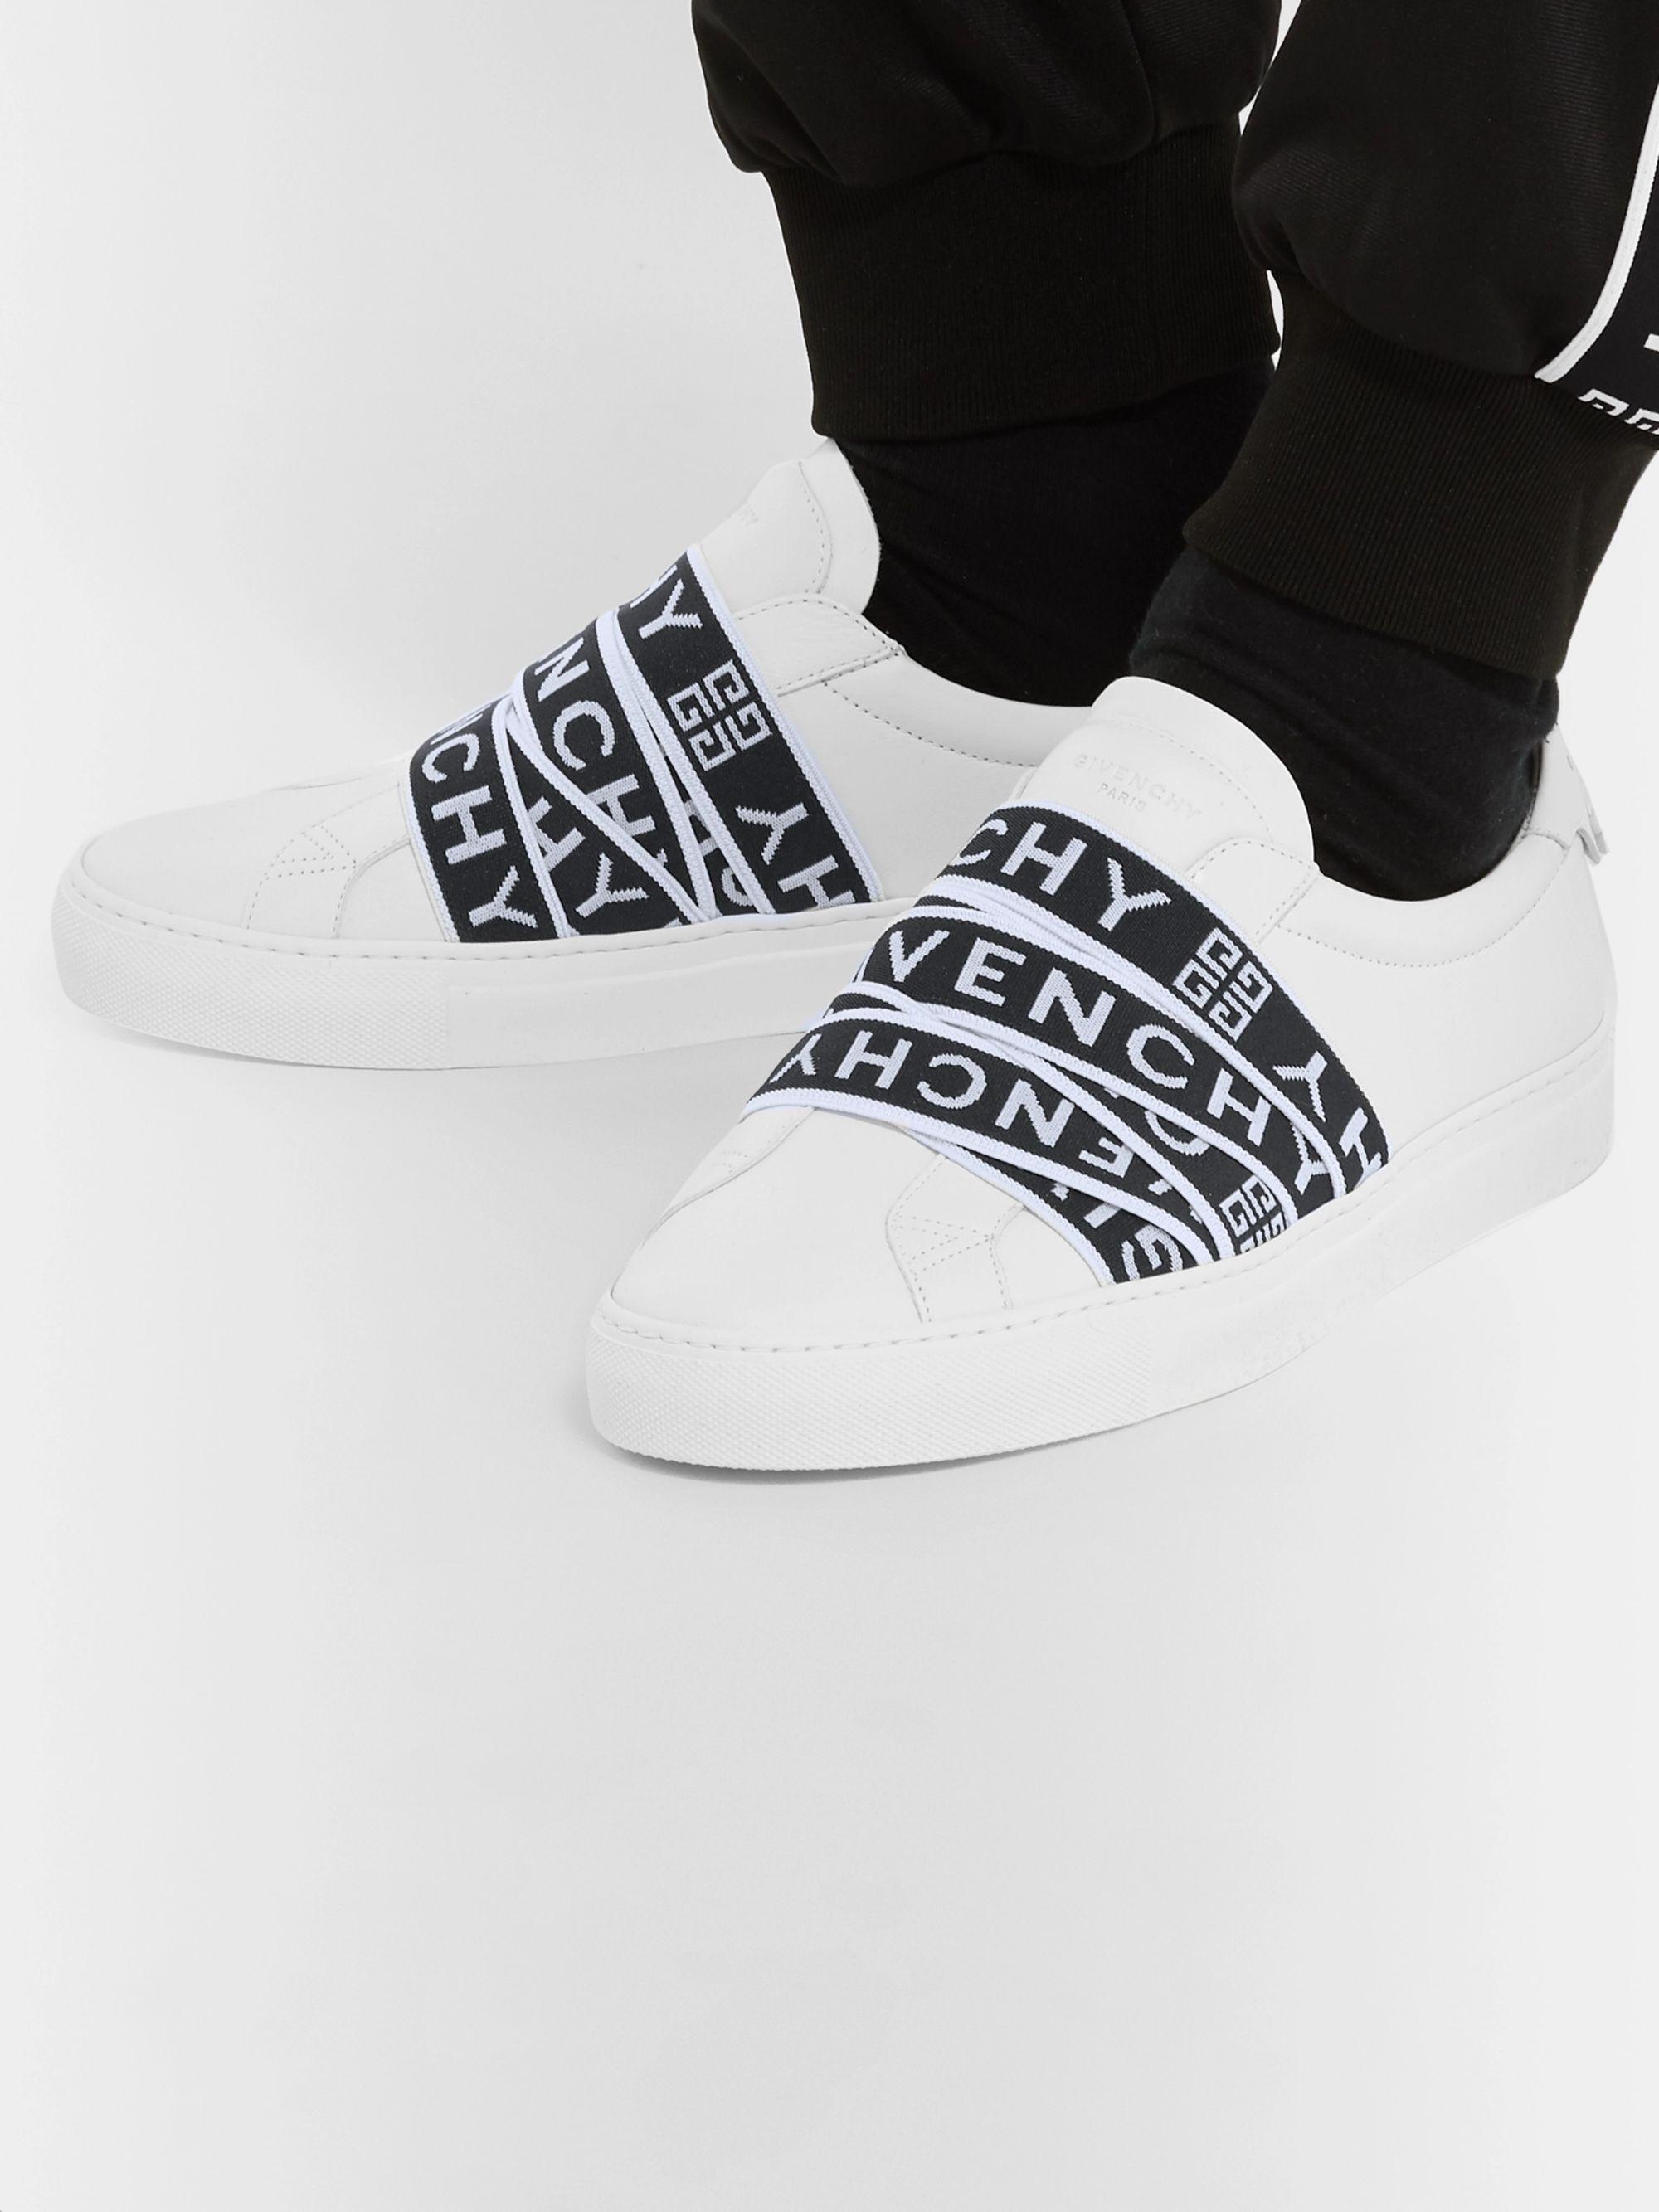 Urban Street Logo Jacquard Leather Slip On Sneakers